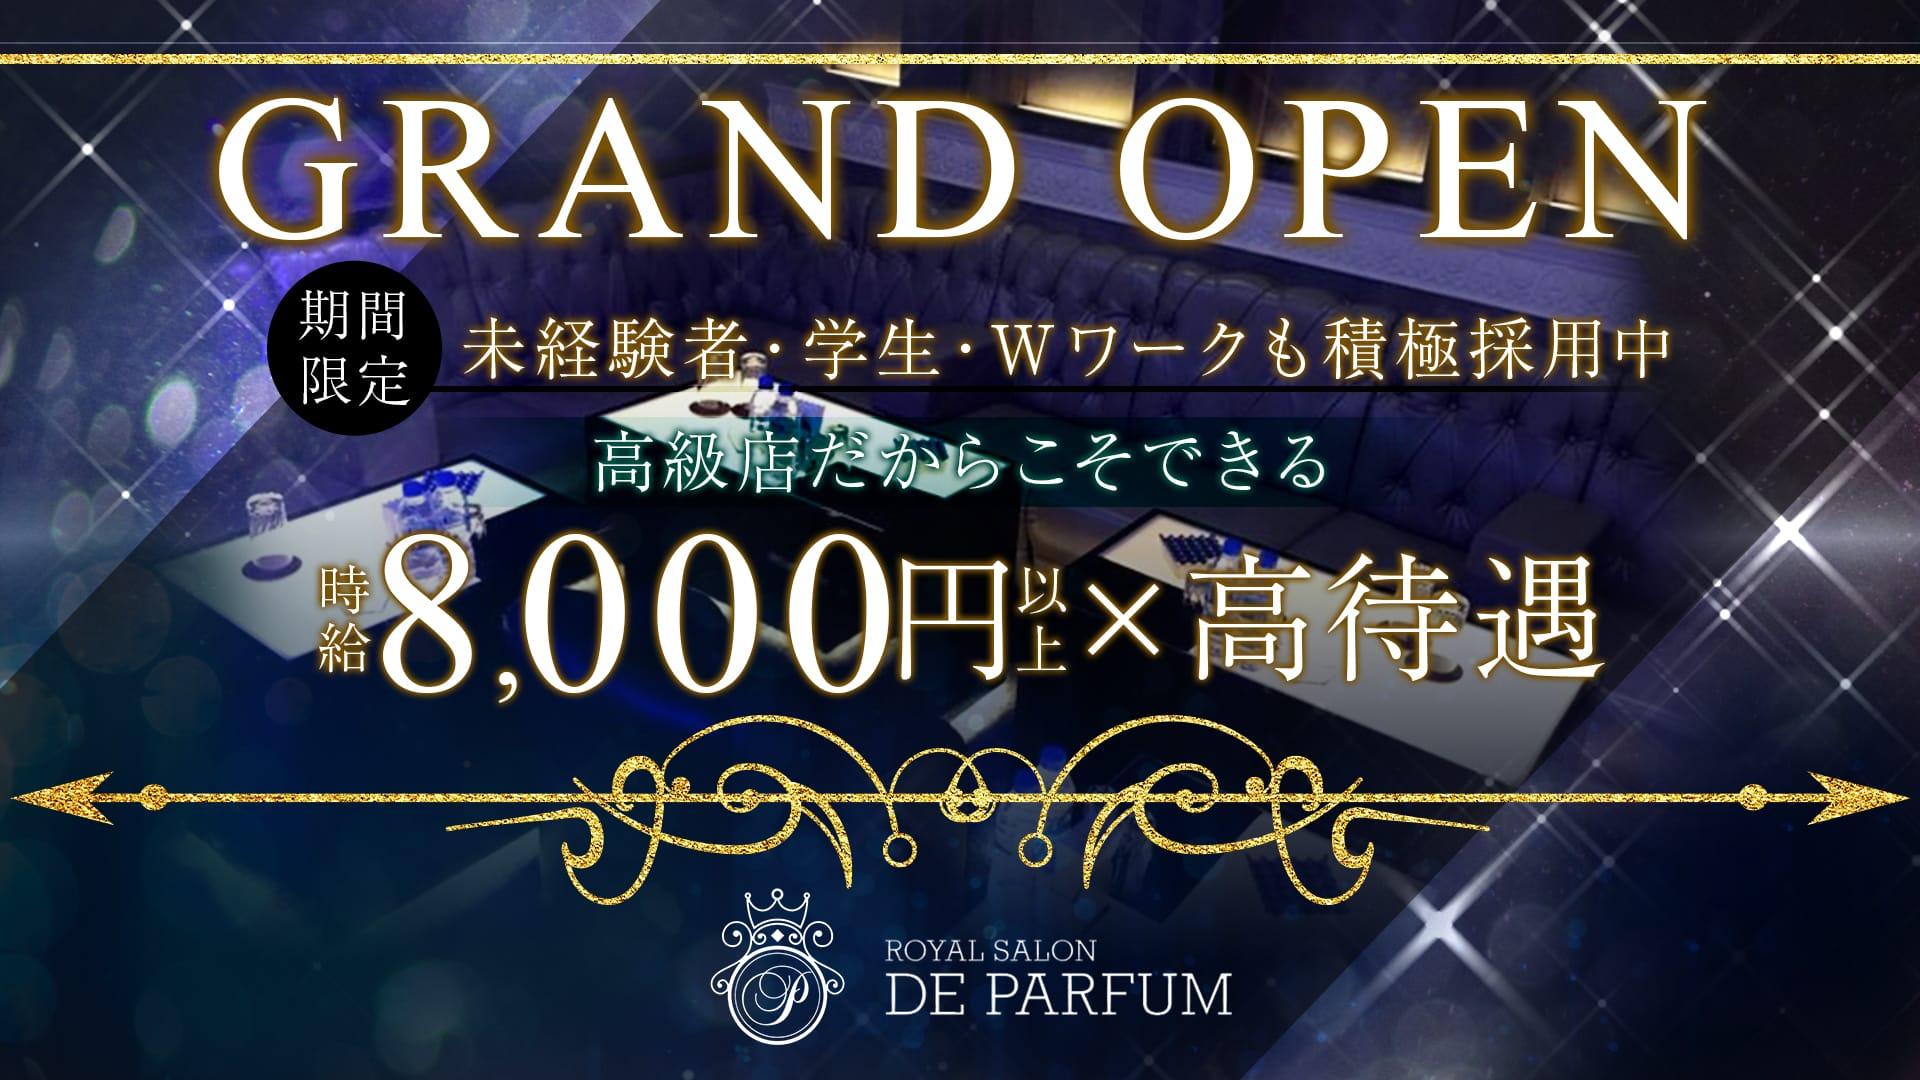 Royal Salon De Parfum(ロイヤルサロン・ドゥ・パルファン) 錦糸町キャバクラ TOP画像